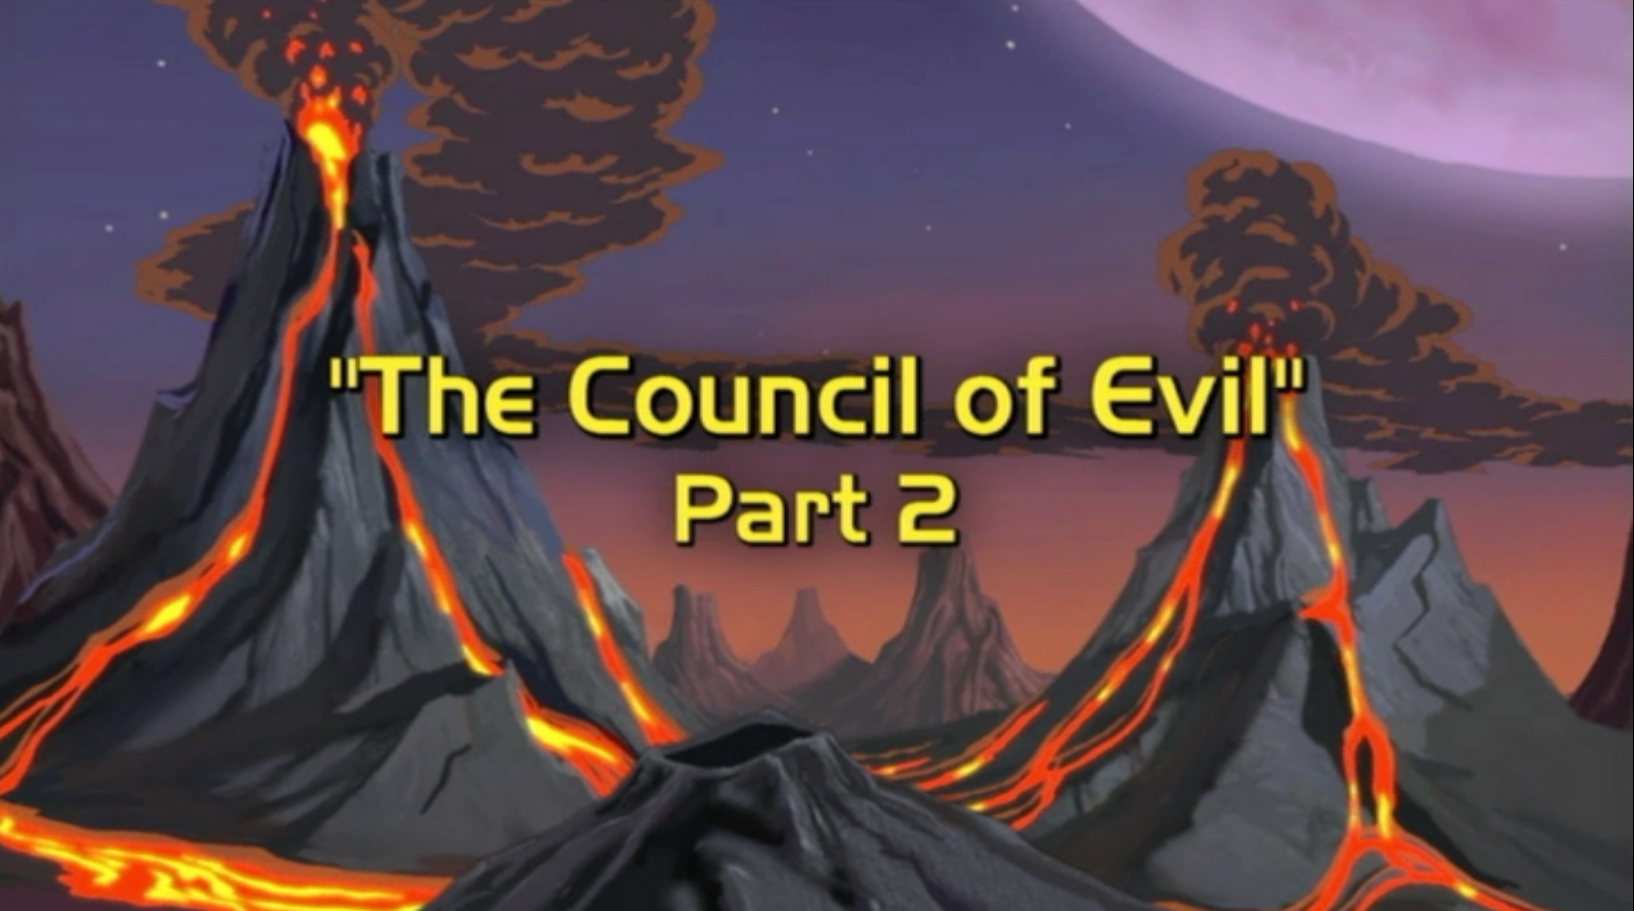 The Council of Evil, Part 2